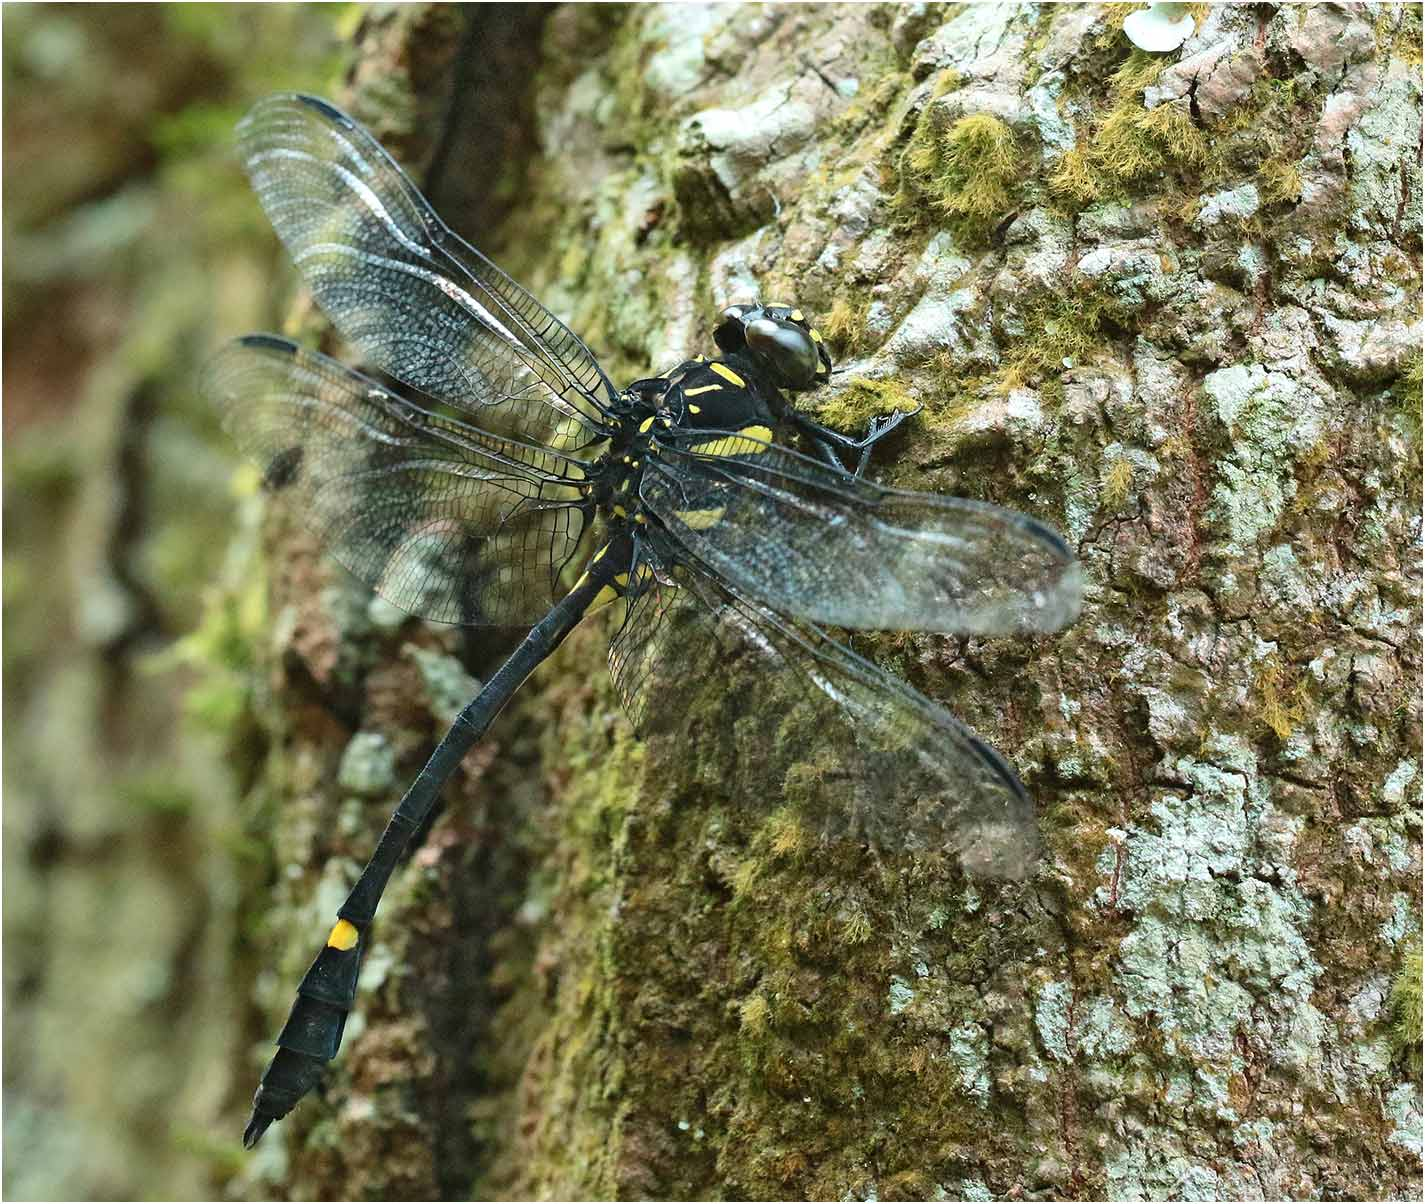 Gomphidictinus perakensis mâle, Vietnam, Xuan Son, 08/06/2019